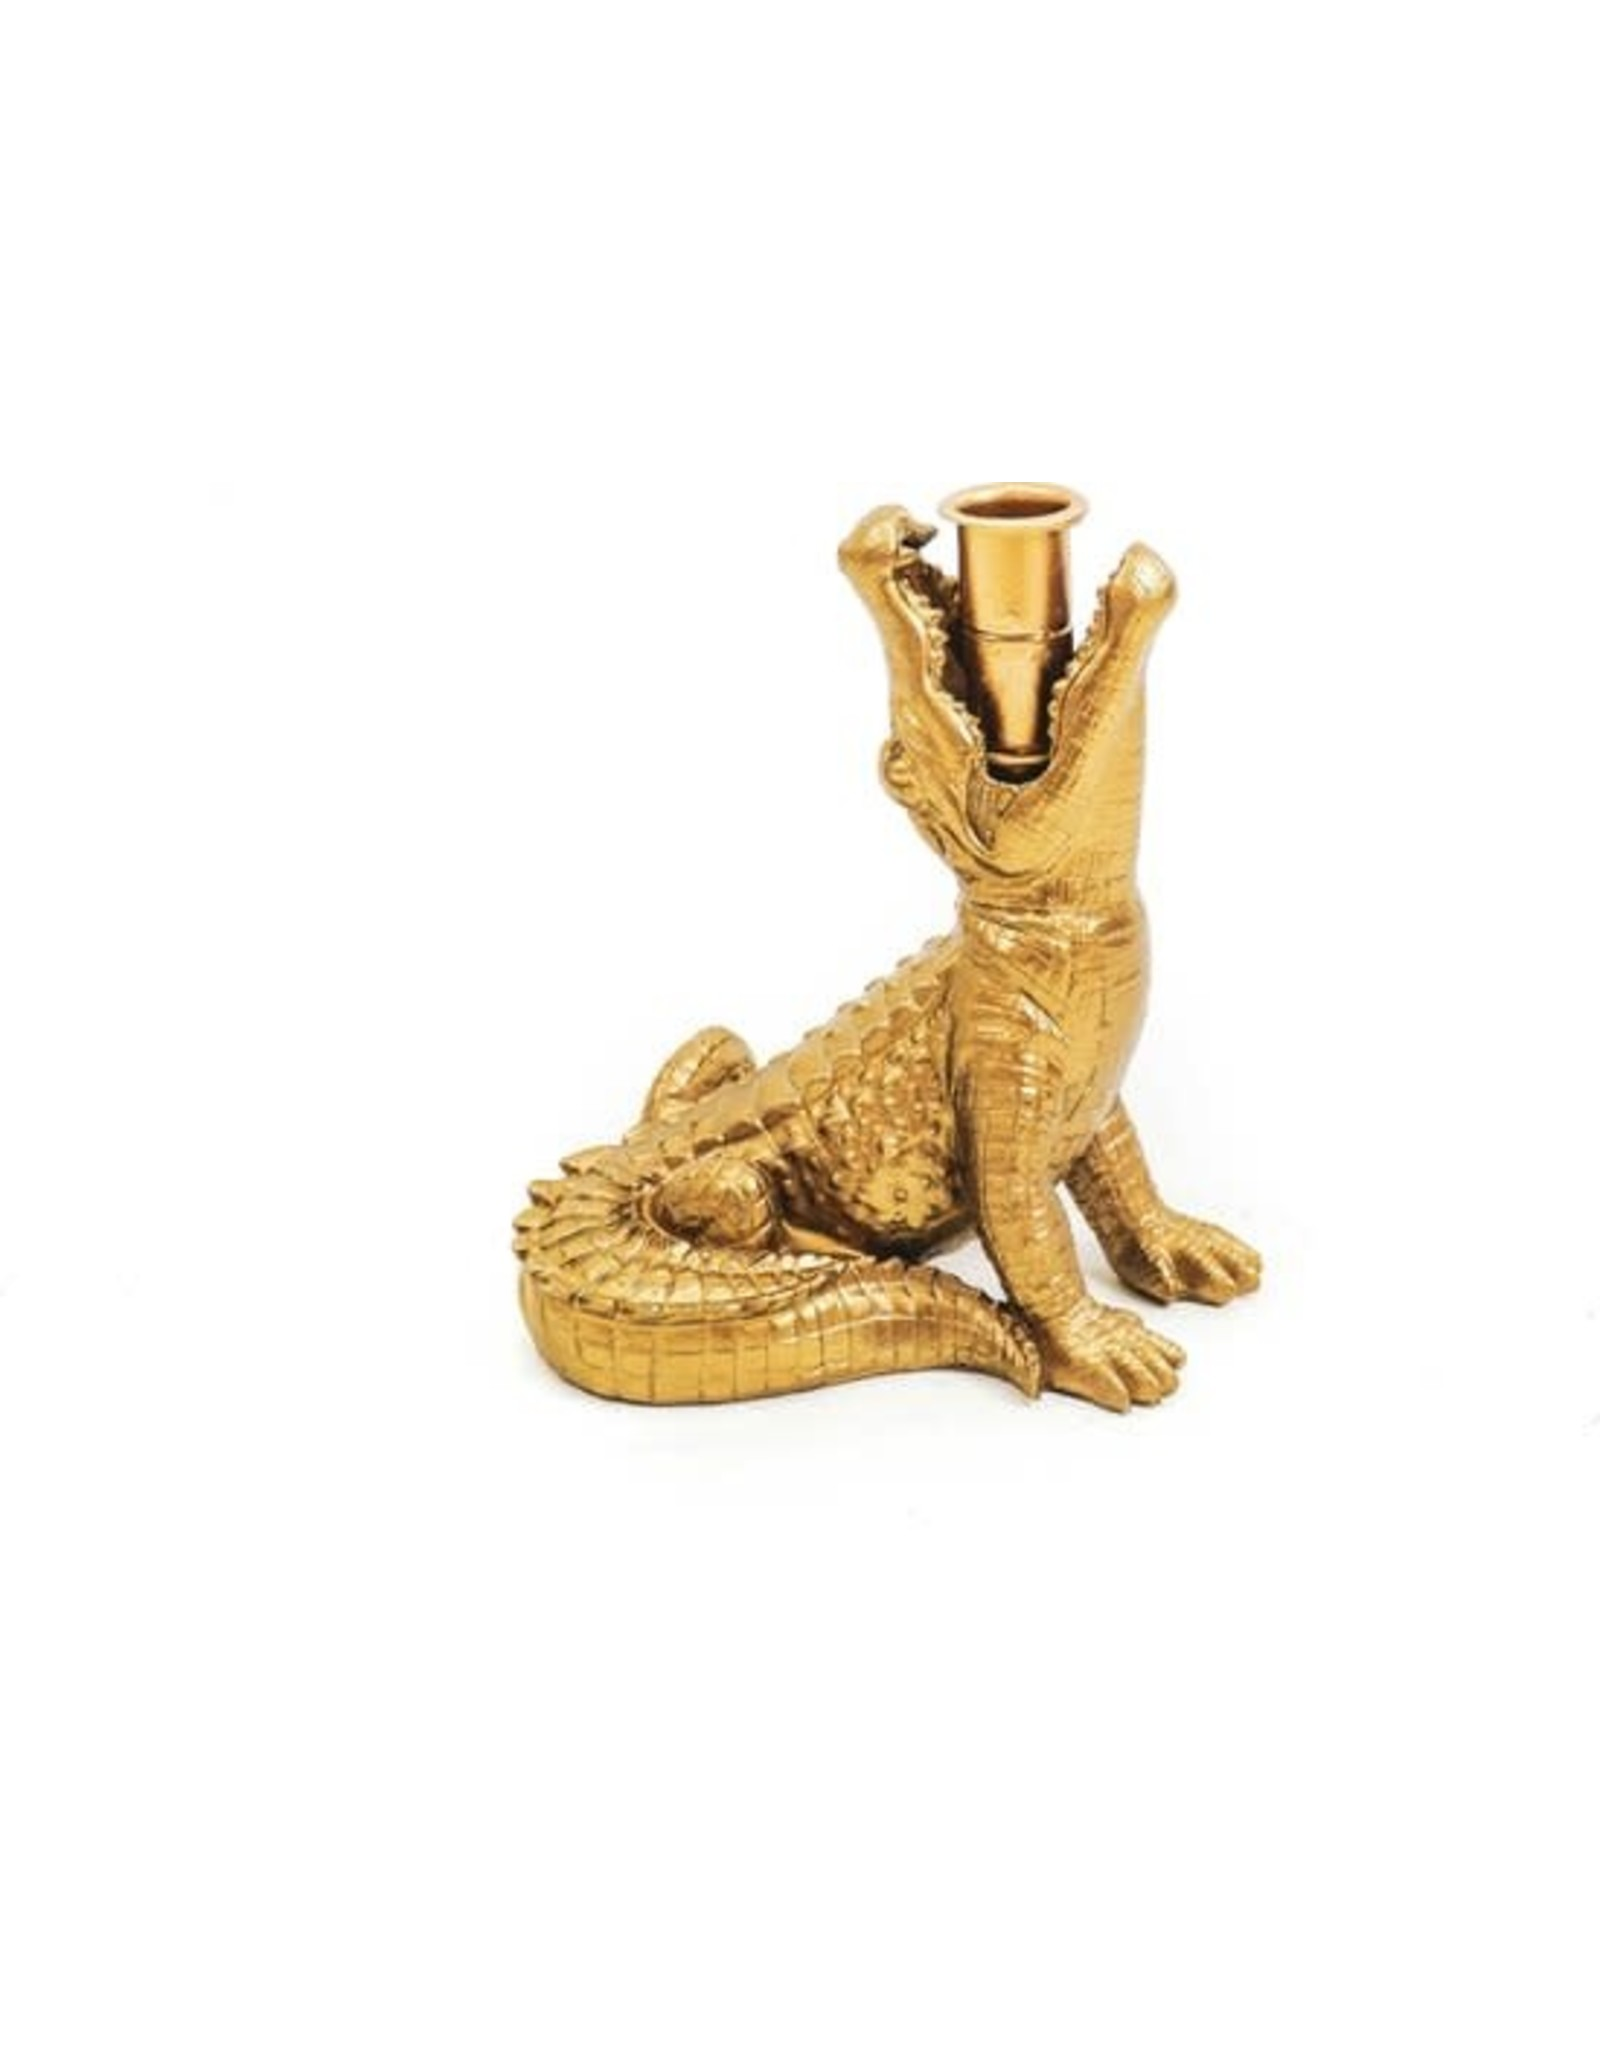 House vitamin HV Krokodil Kandelaar Goud.